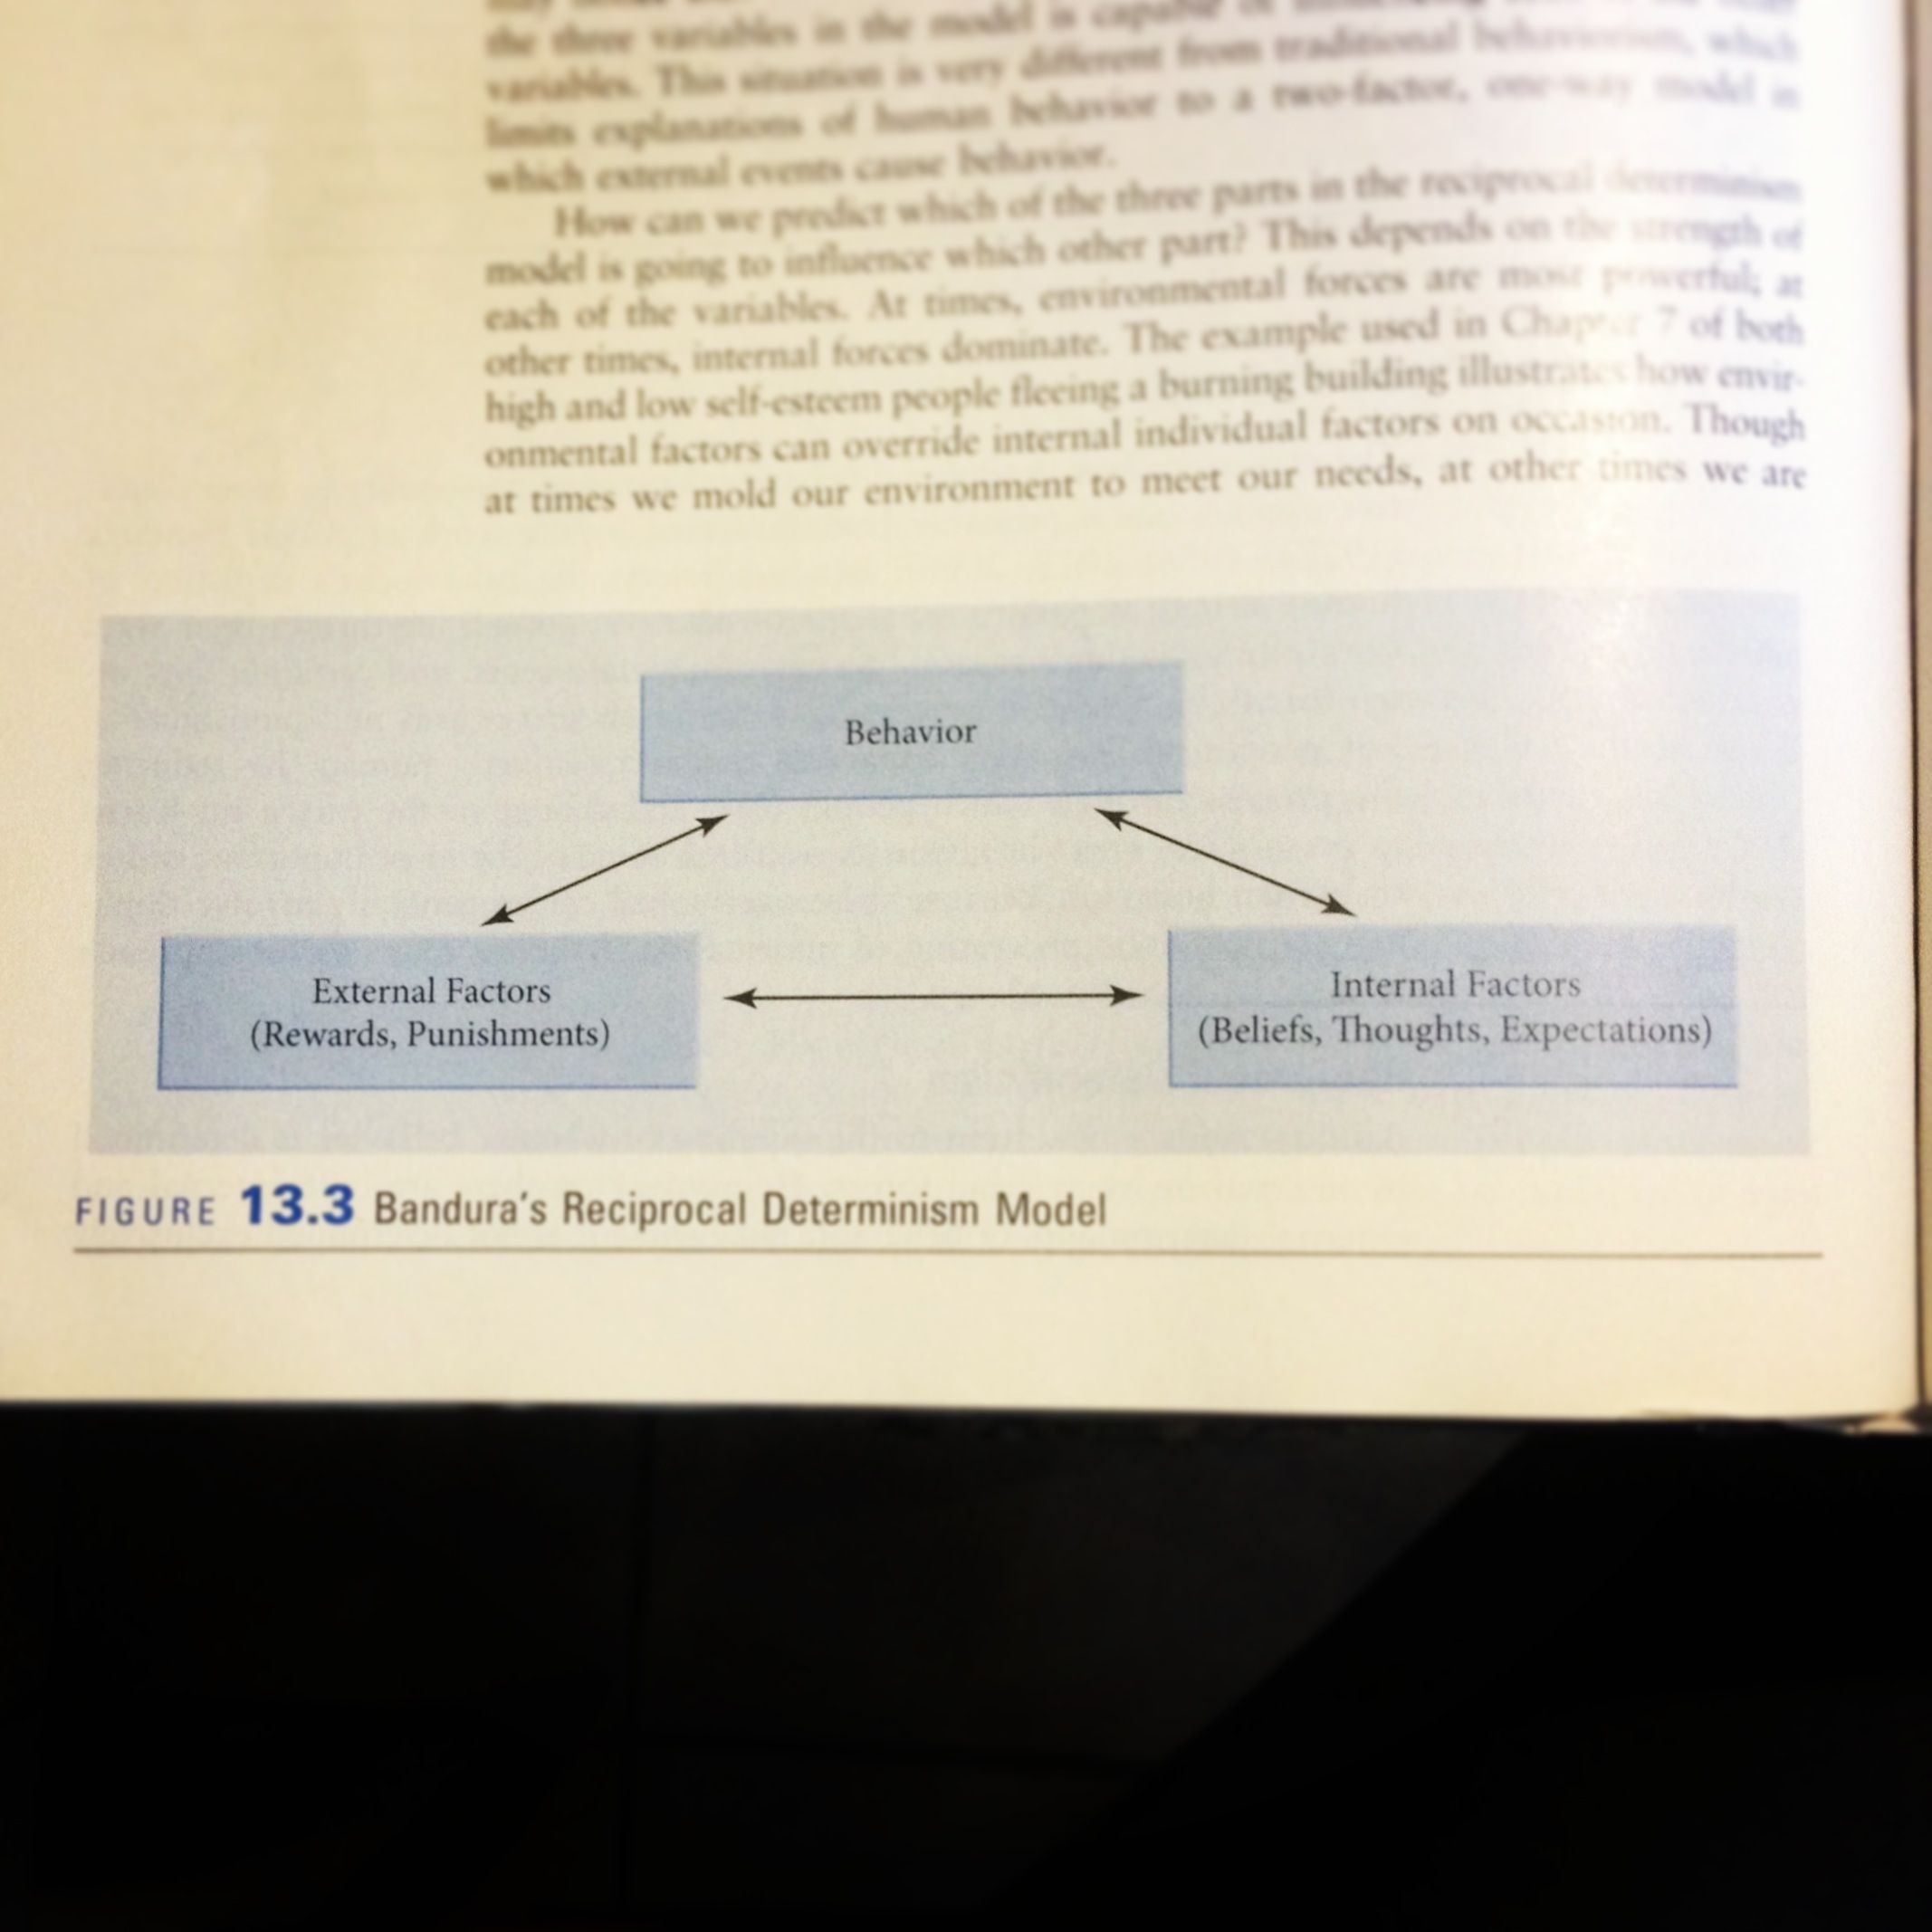 Bandura Social Learning Theory Diagram 1985 Ford F150 Fuse Box 39s Reciprocal Determinism Behavior